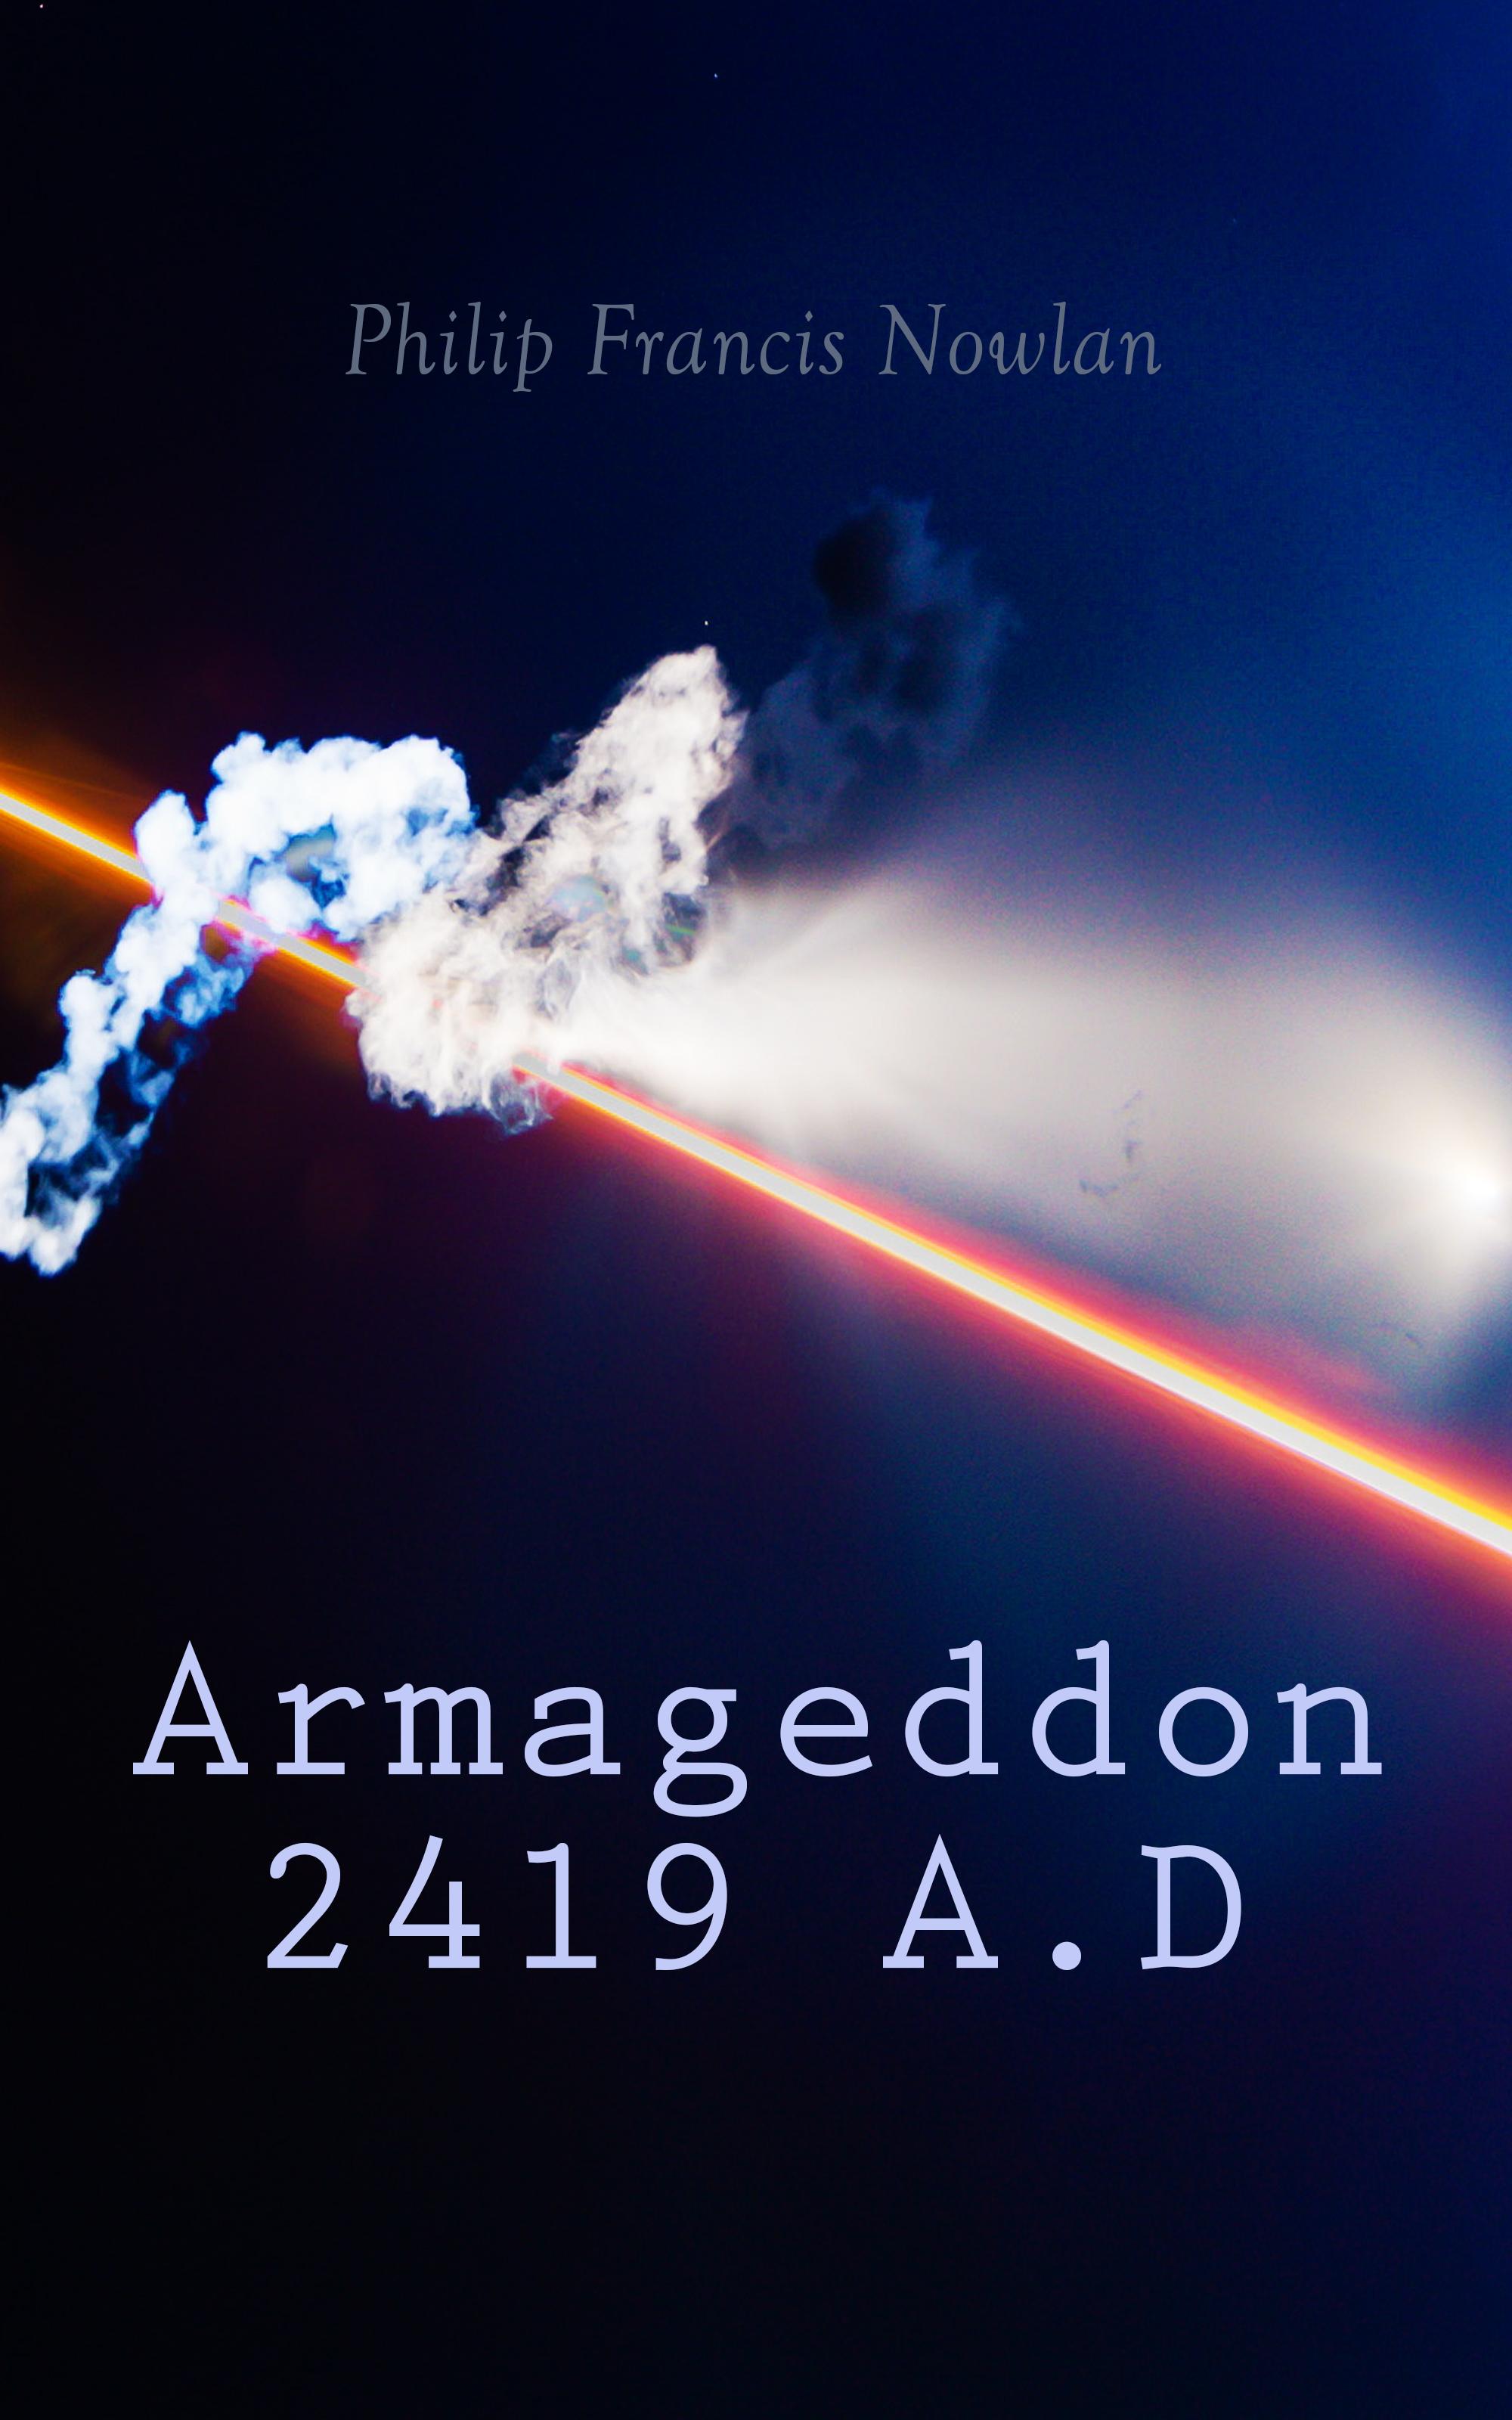 Philip Francis Nowlan Armageddon 2419 A.D